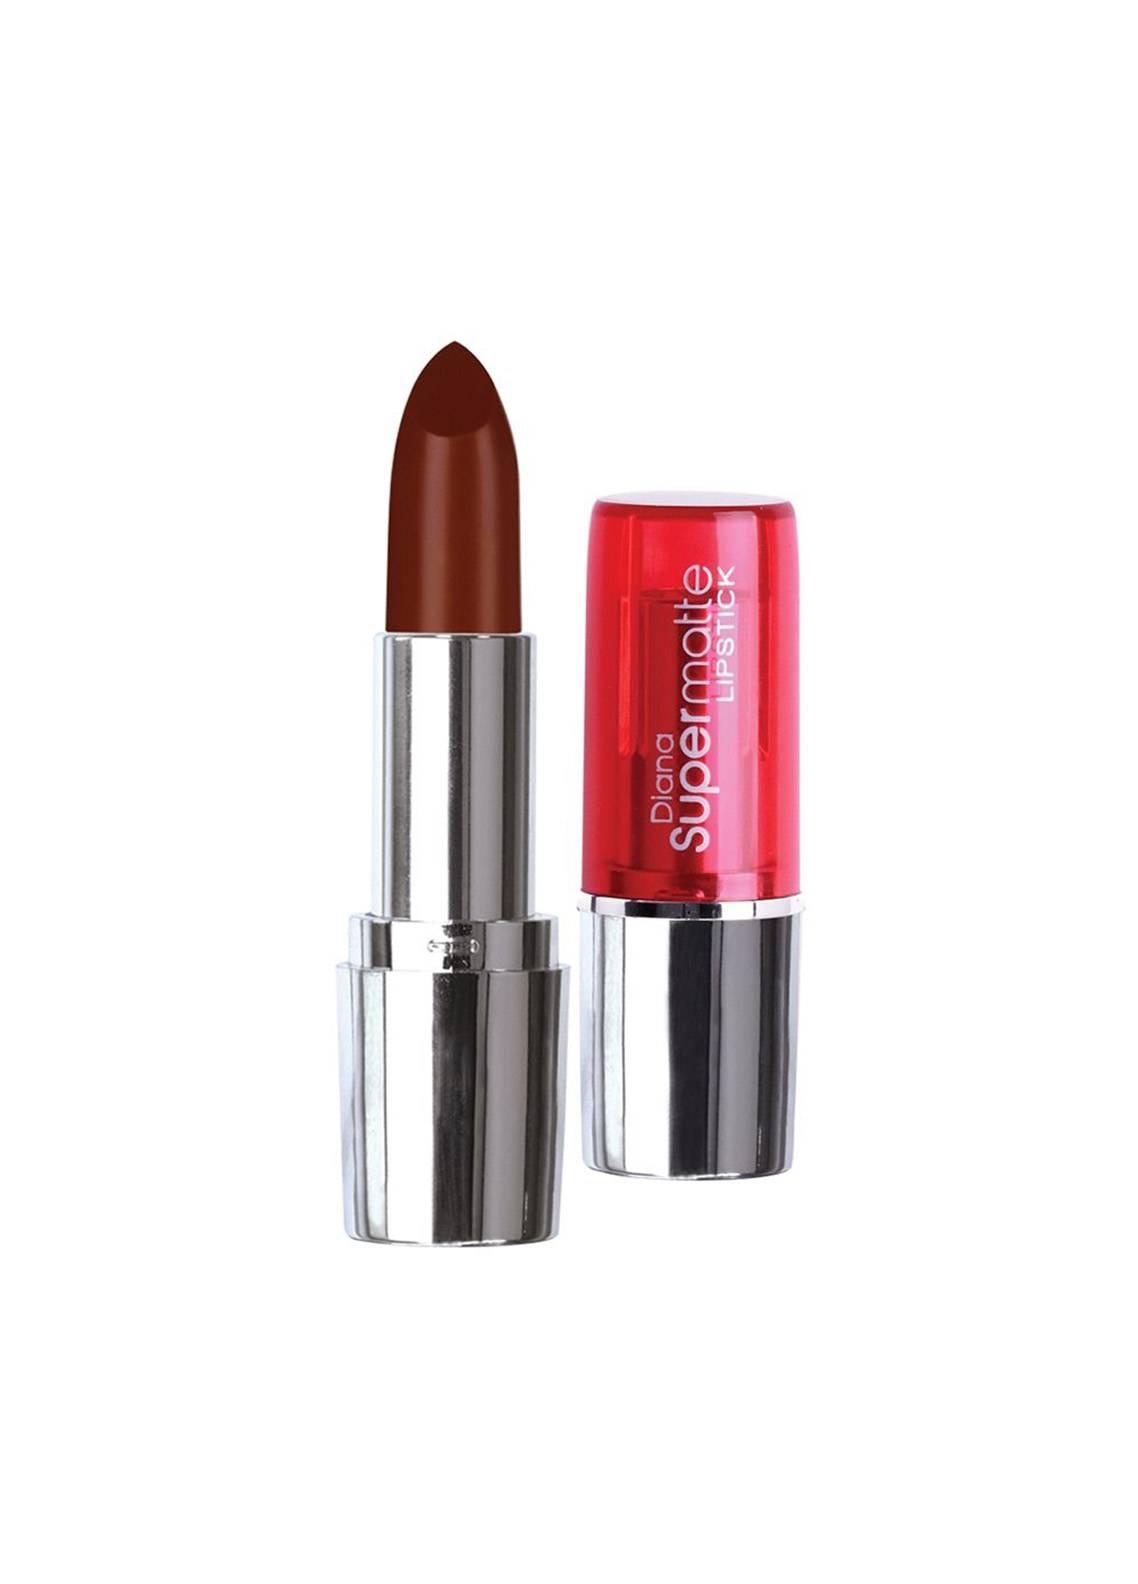 Diana Of London Super Matte Lipstick - 16 Rich Chocolate